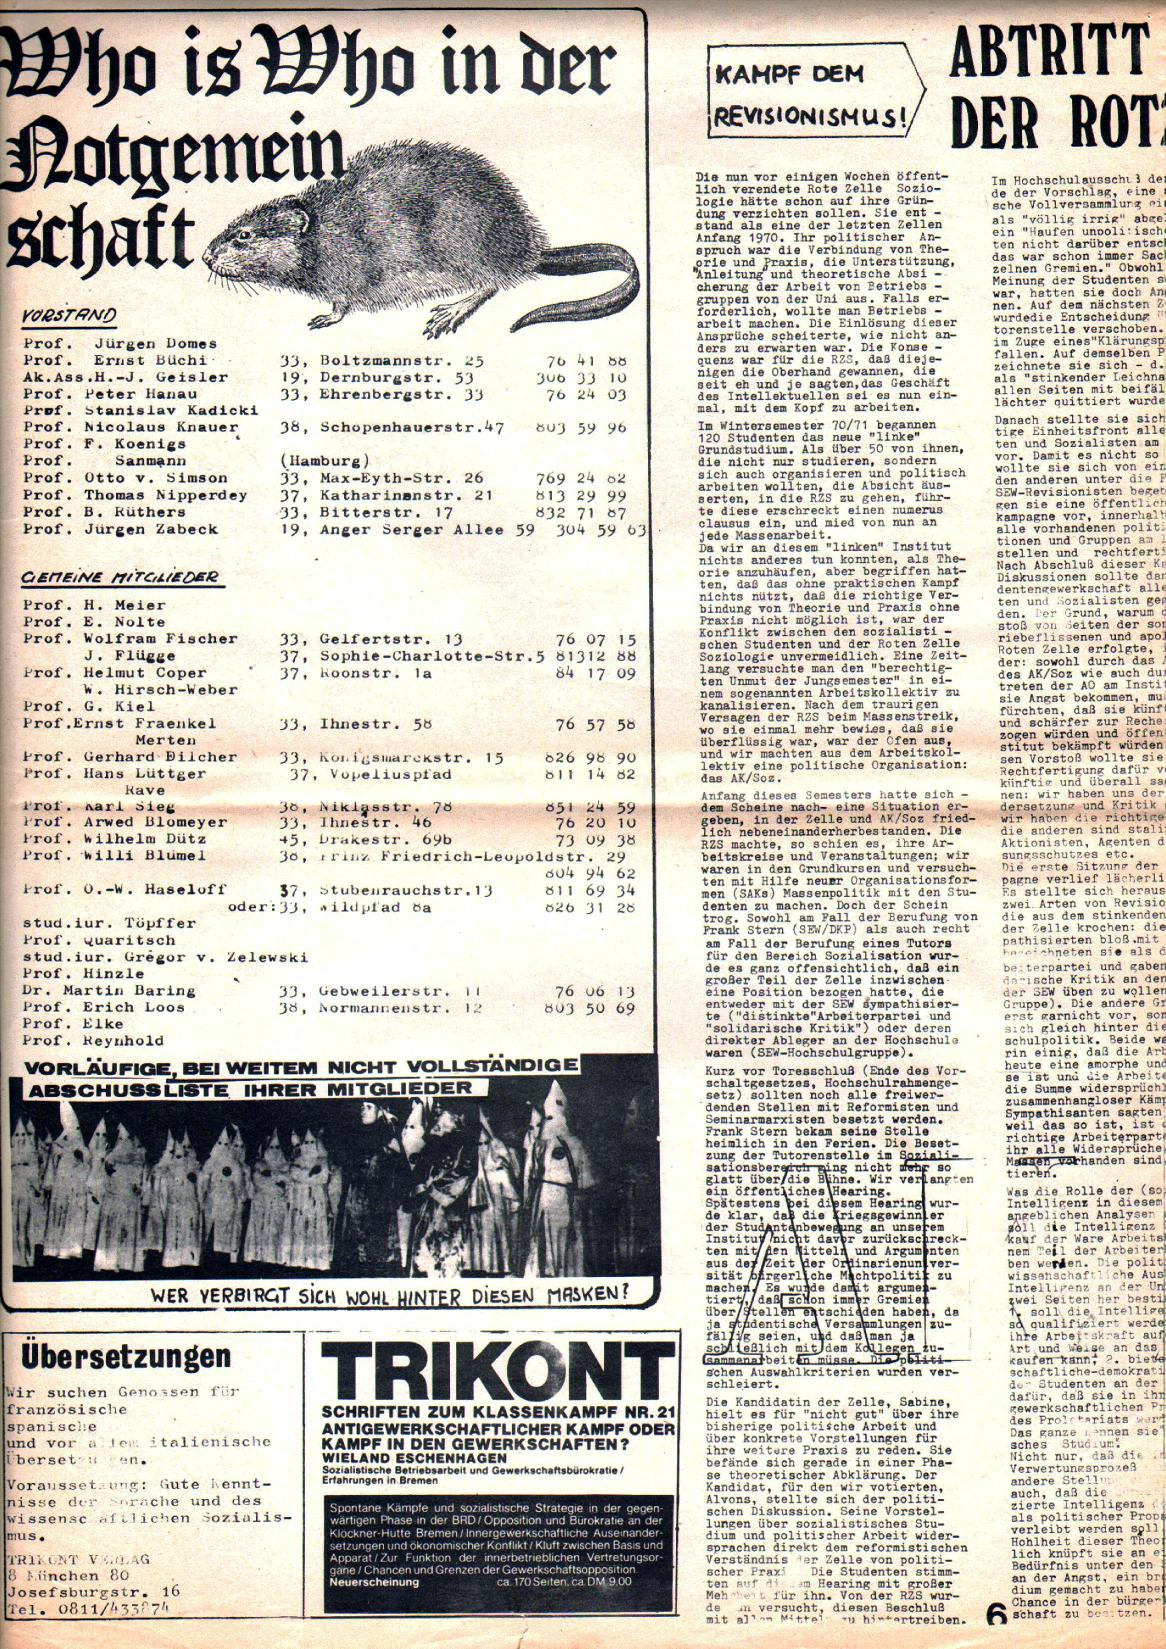 Berlin_Hochschulkampf_1971_12_06